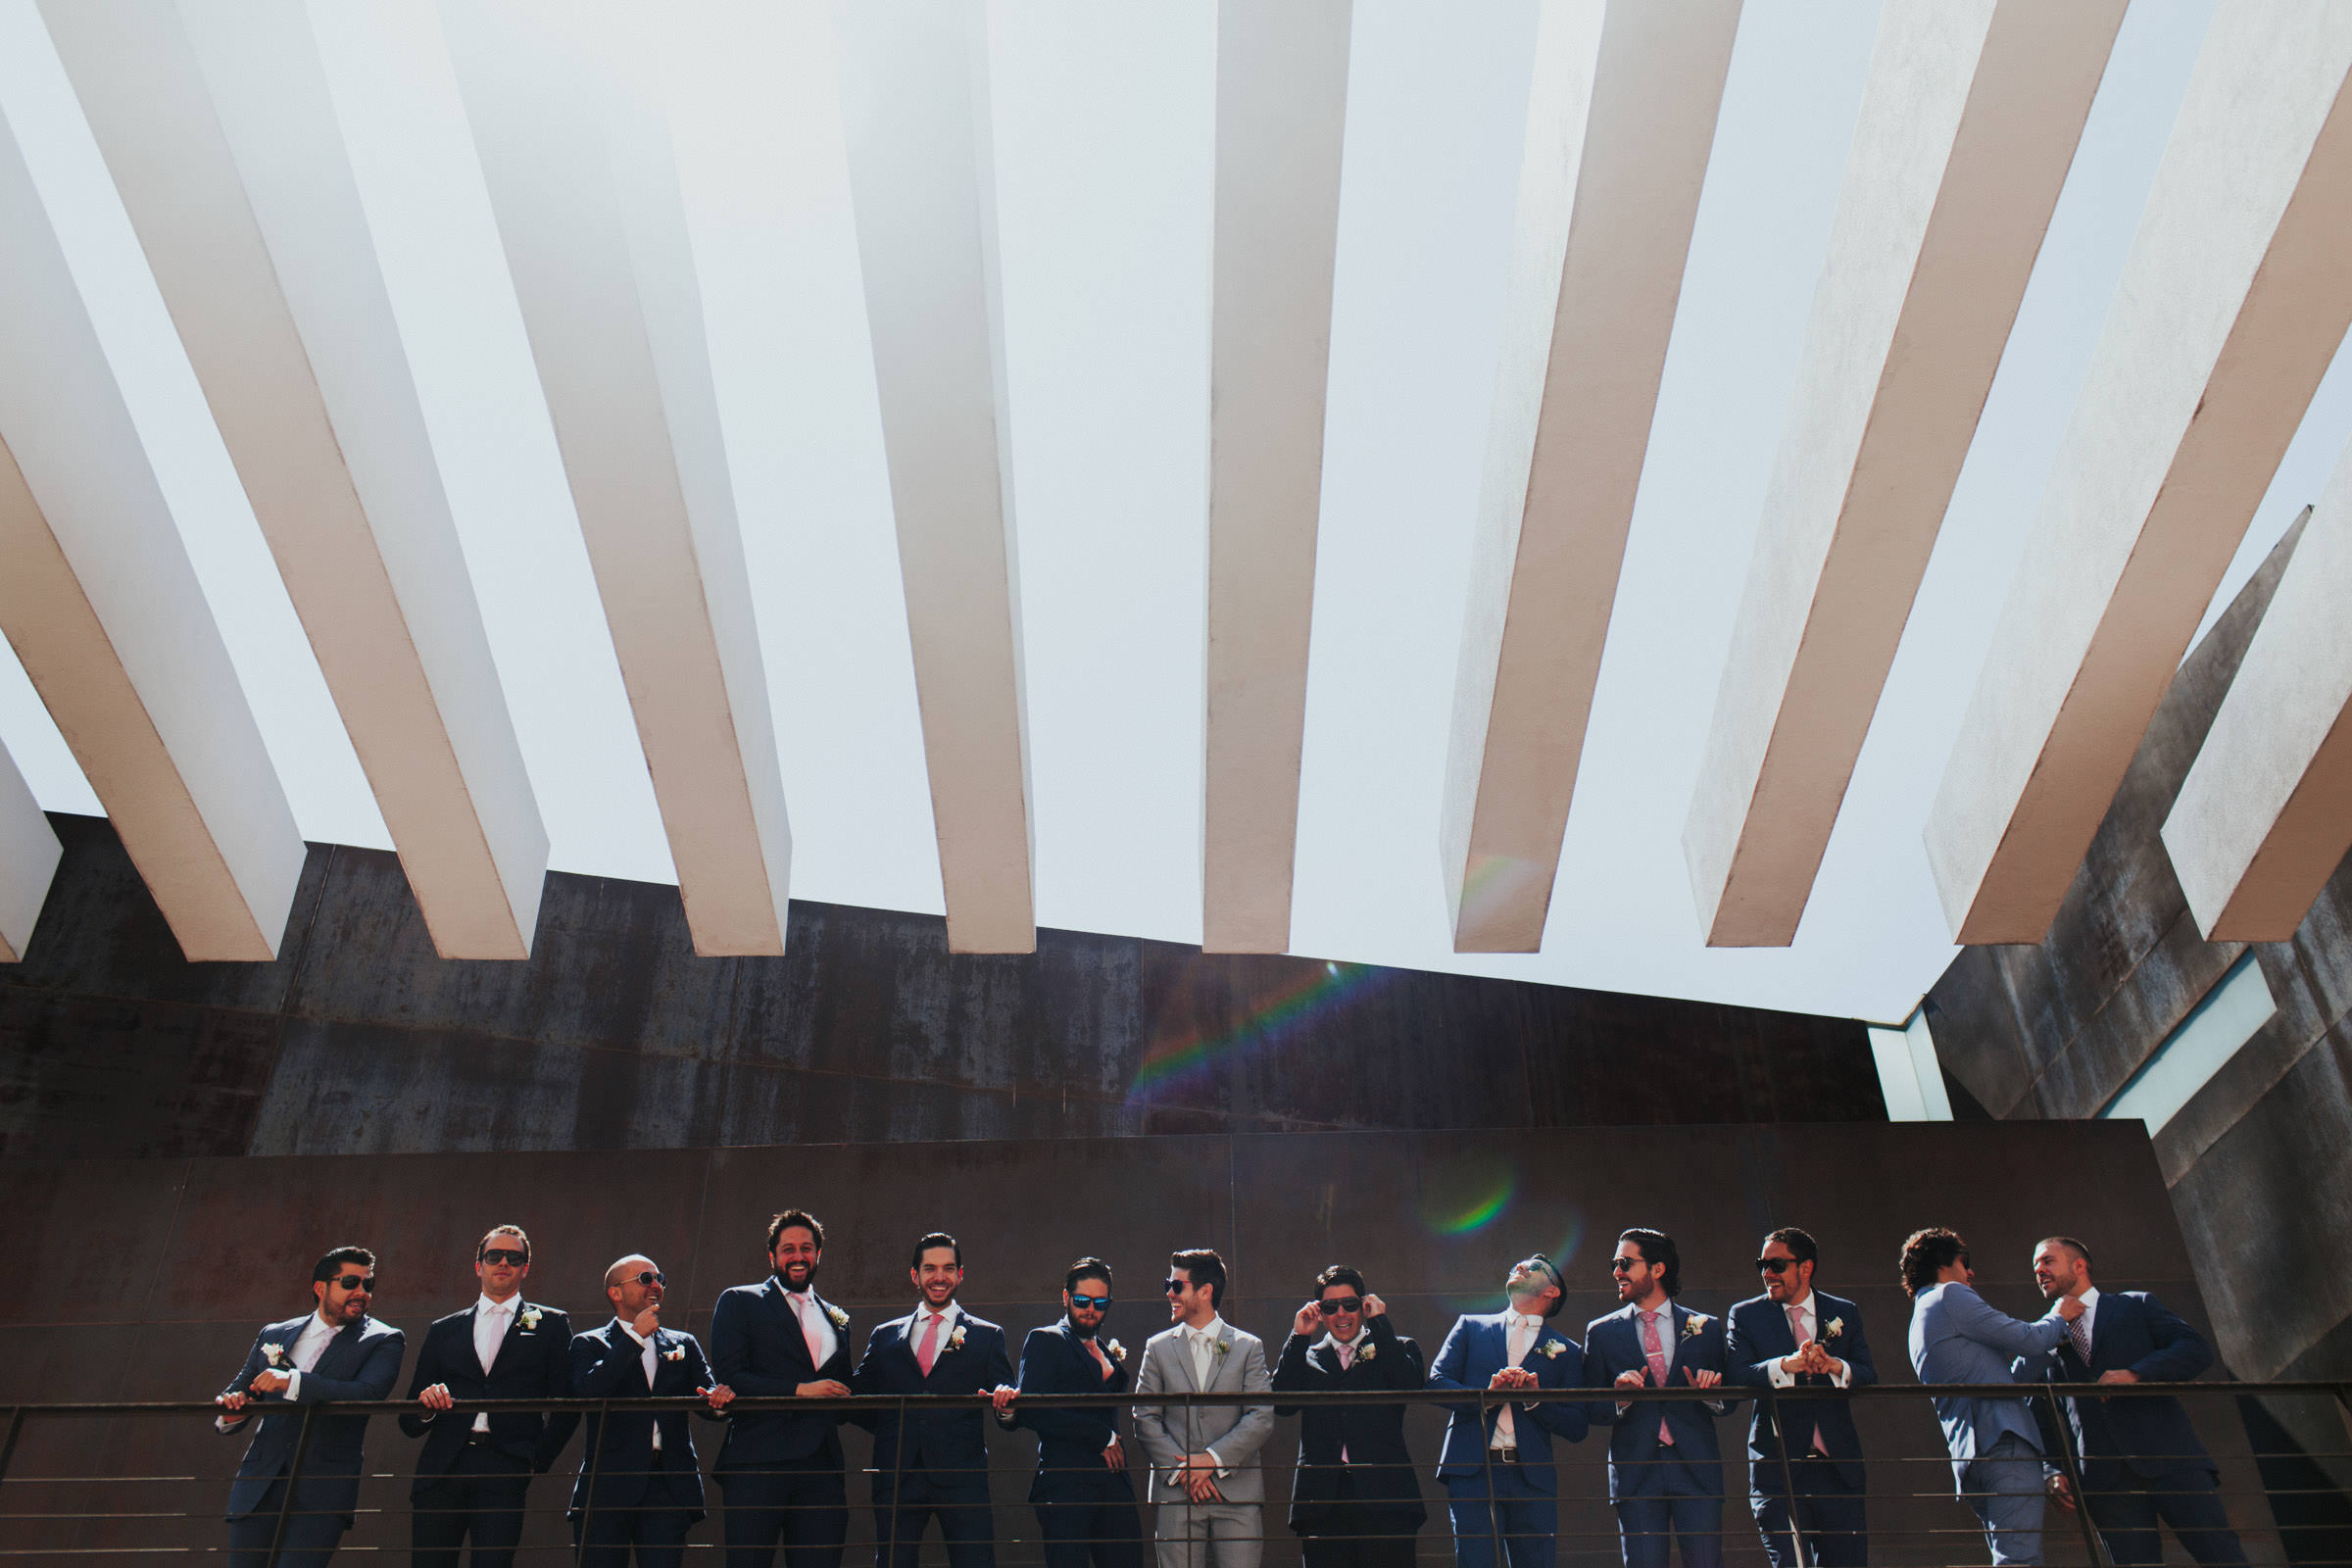 Boda-Guanajuato-Fotografia-Casa-de-Piedra-Leon-San-Miguel-Allende-Mariana-Jorge-Pierce-0123.JPG